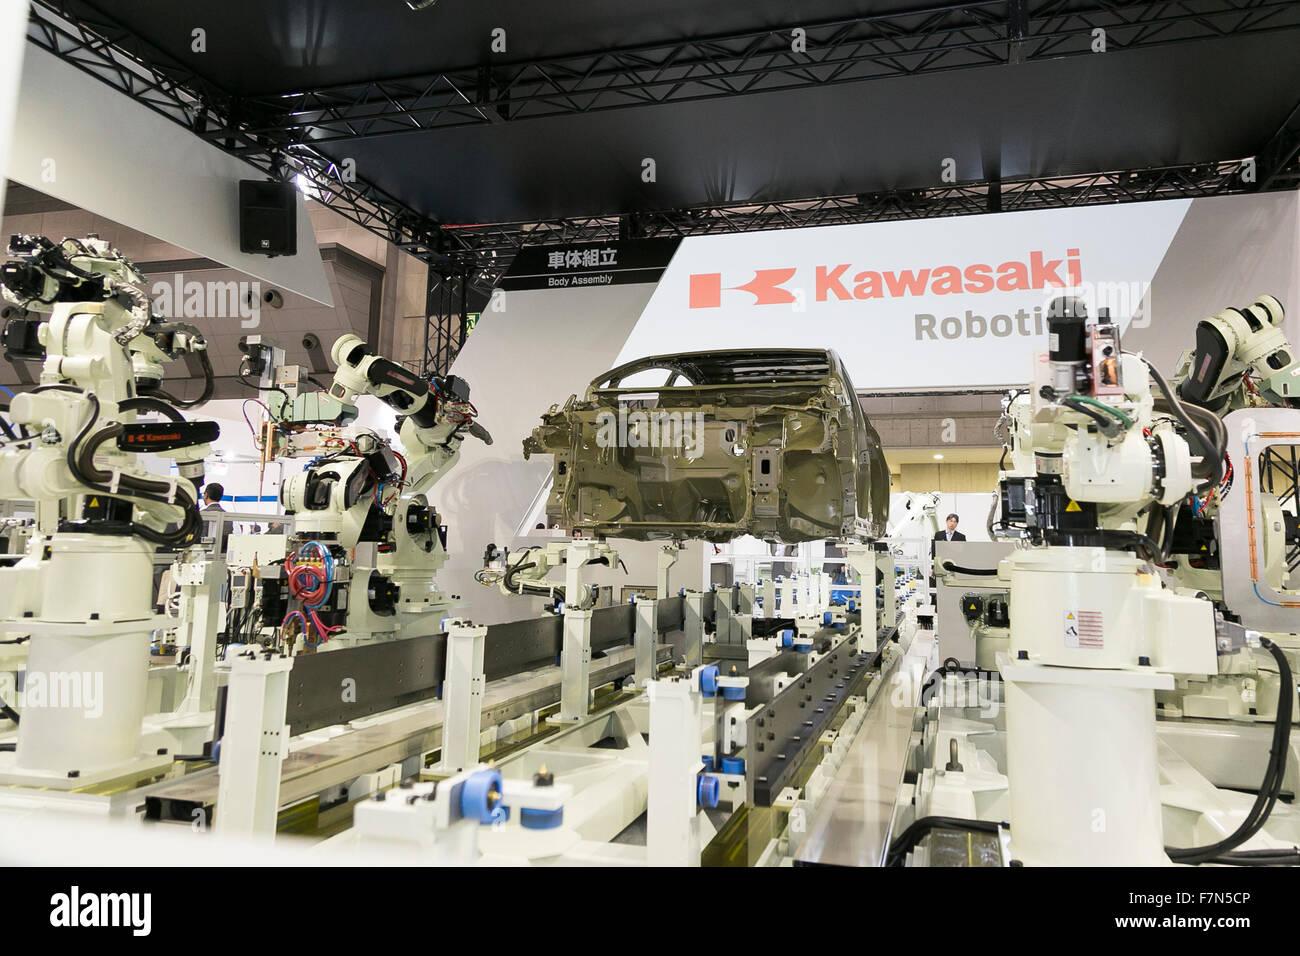 Kawasaki Heavy Industries Ltd.'s body assembly robots perform at the International Robot Exhibition 2015 on December Stock Photo